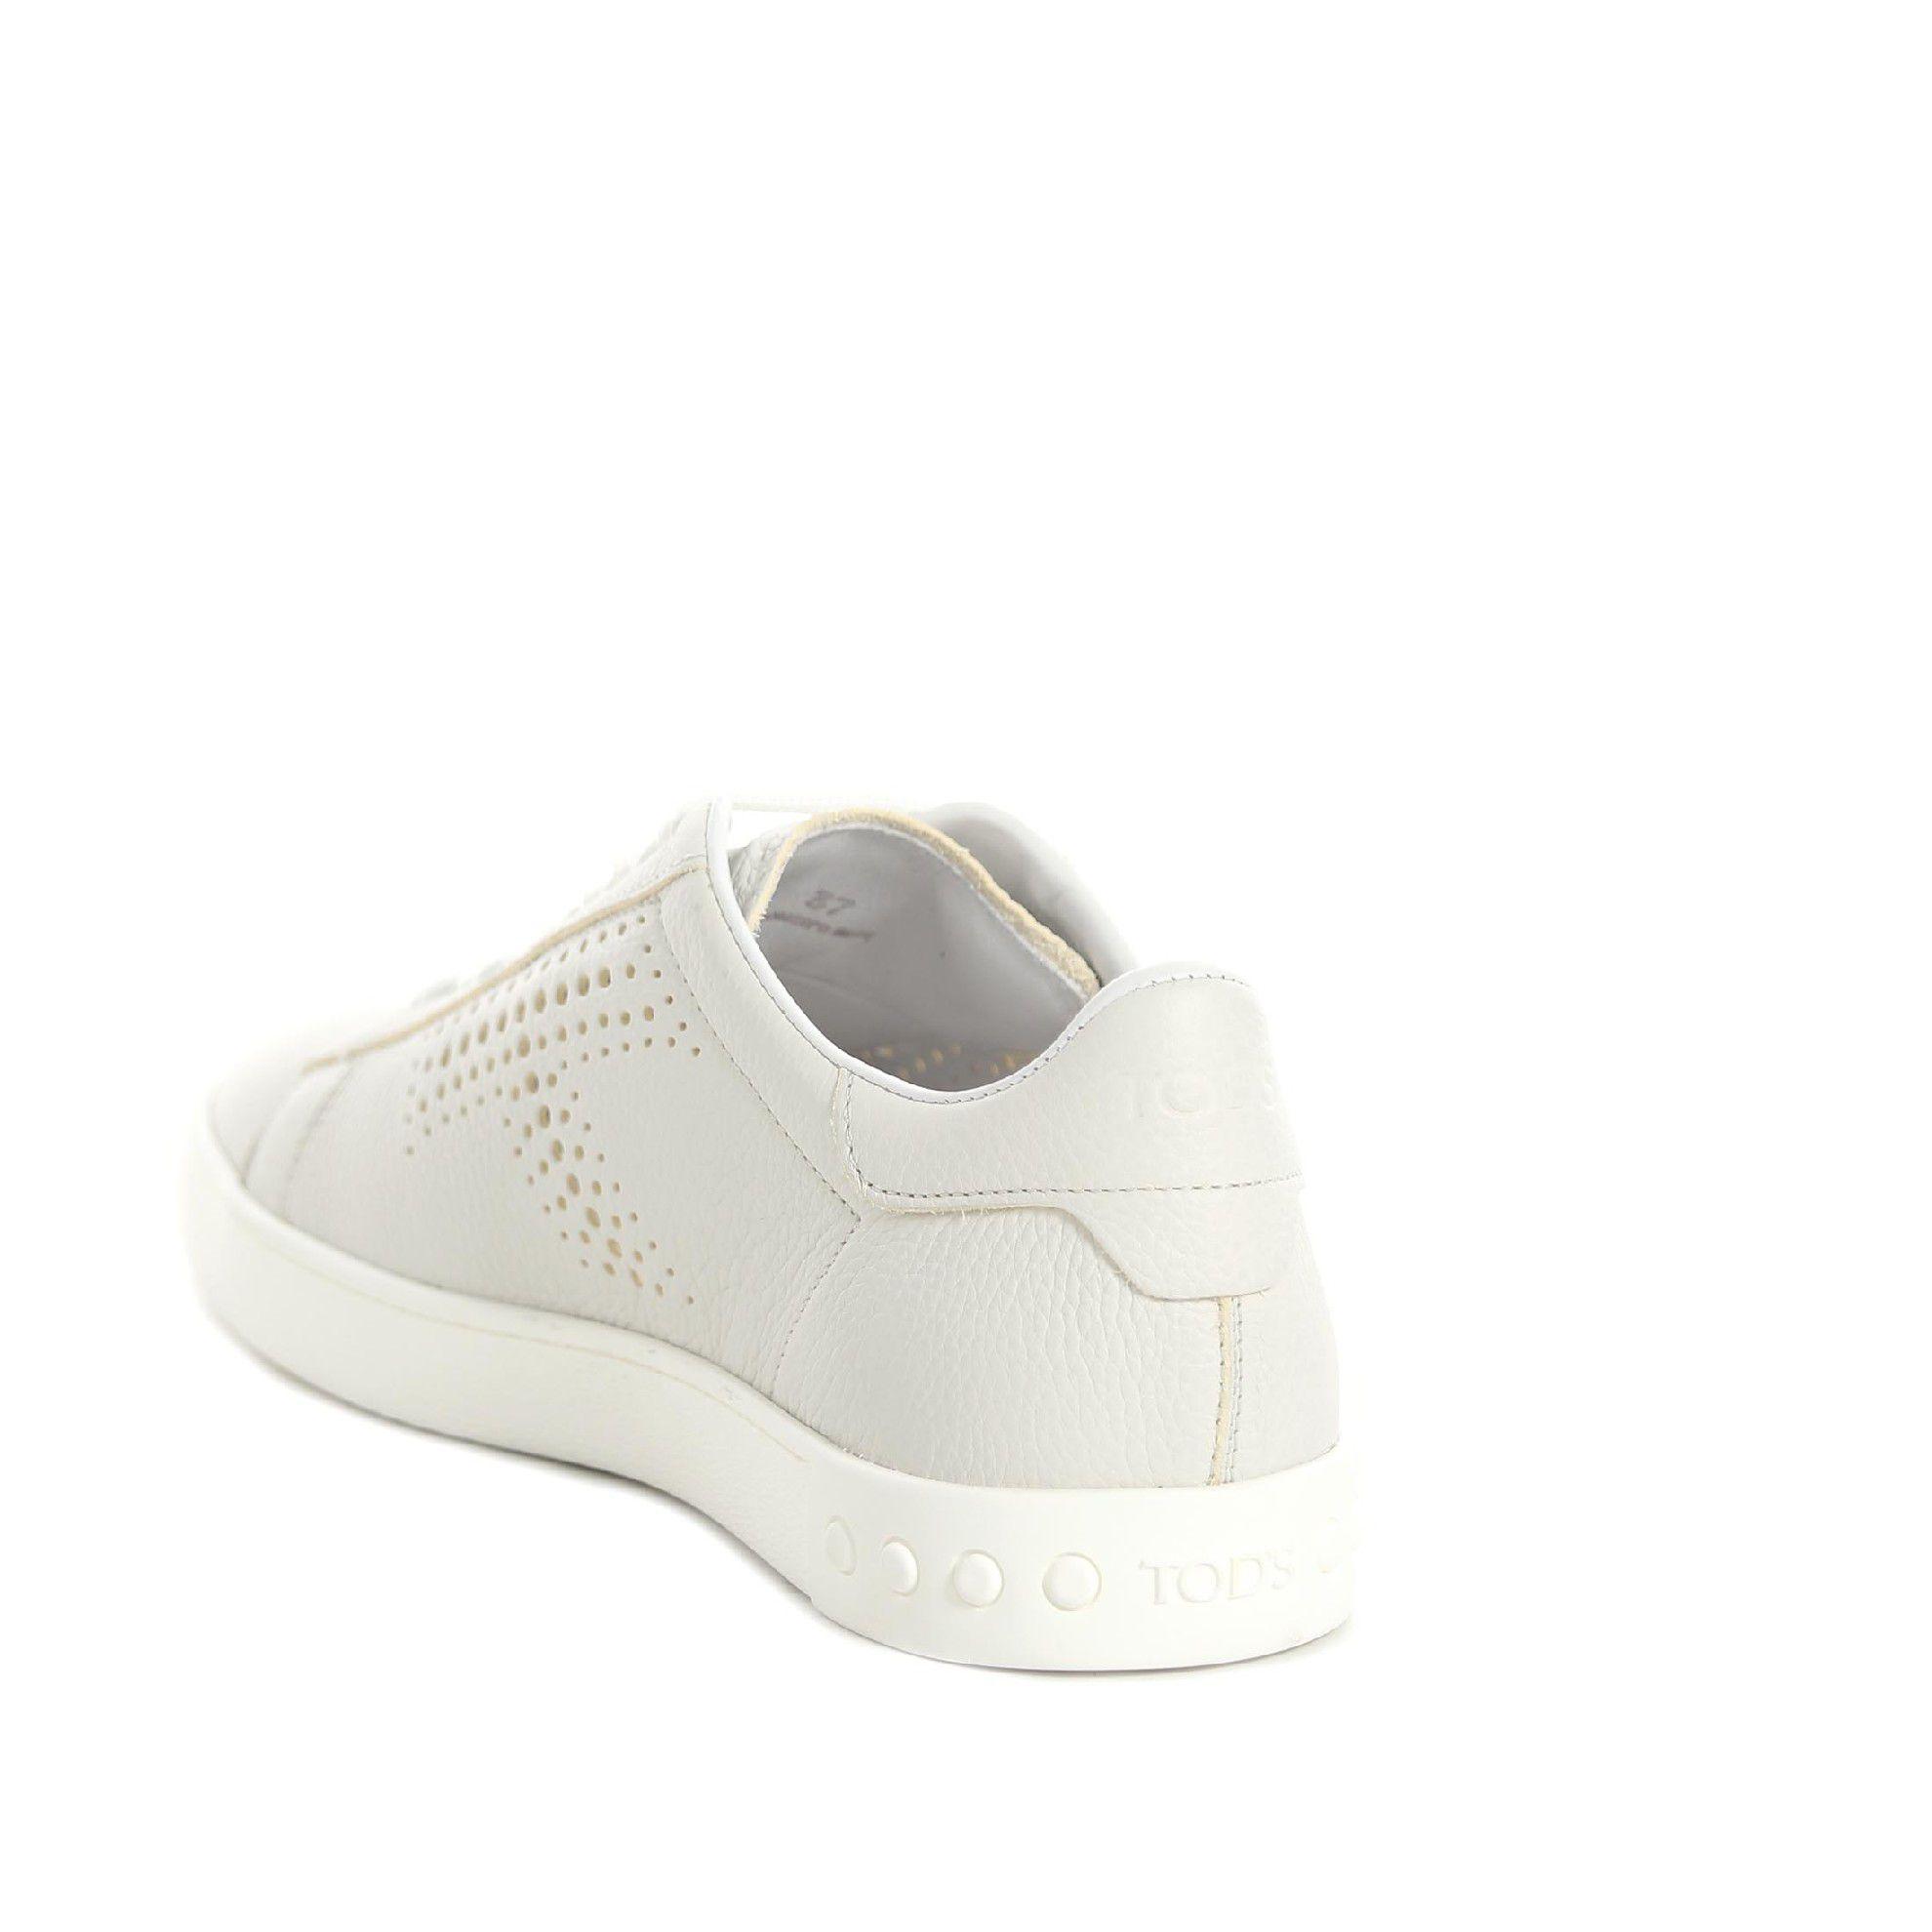 Tod's sneaker in pelle da donna